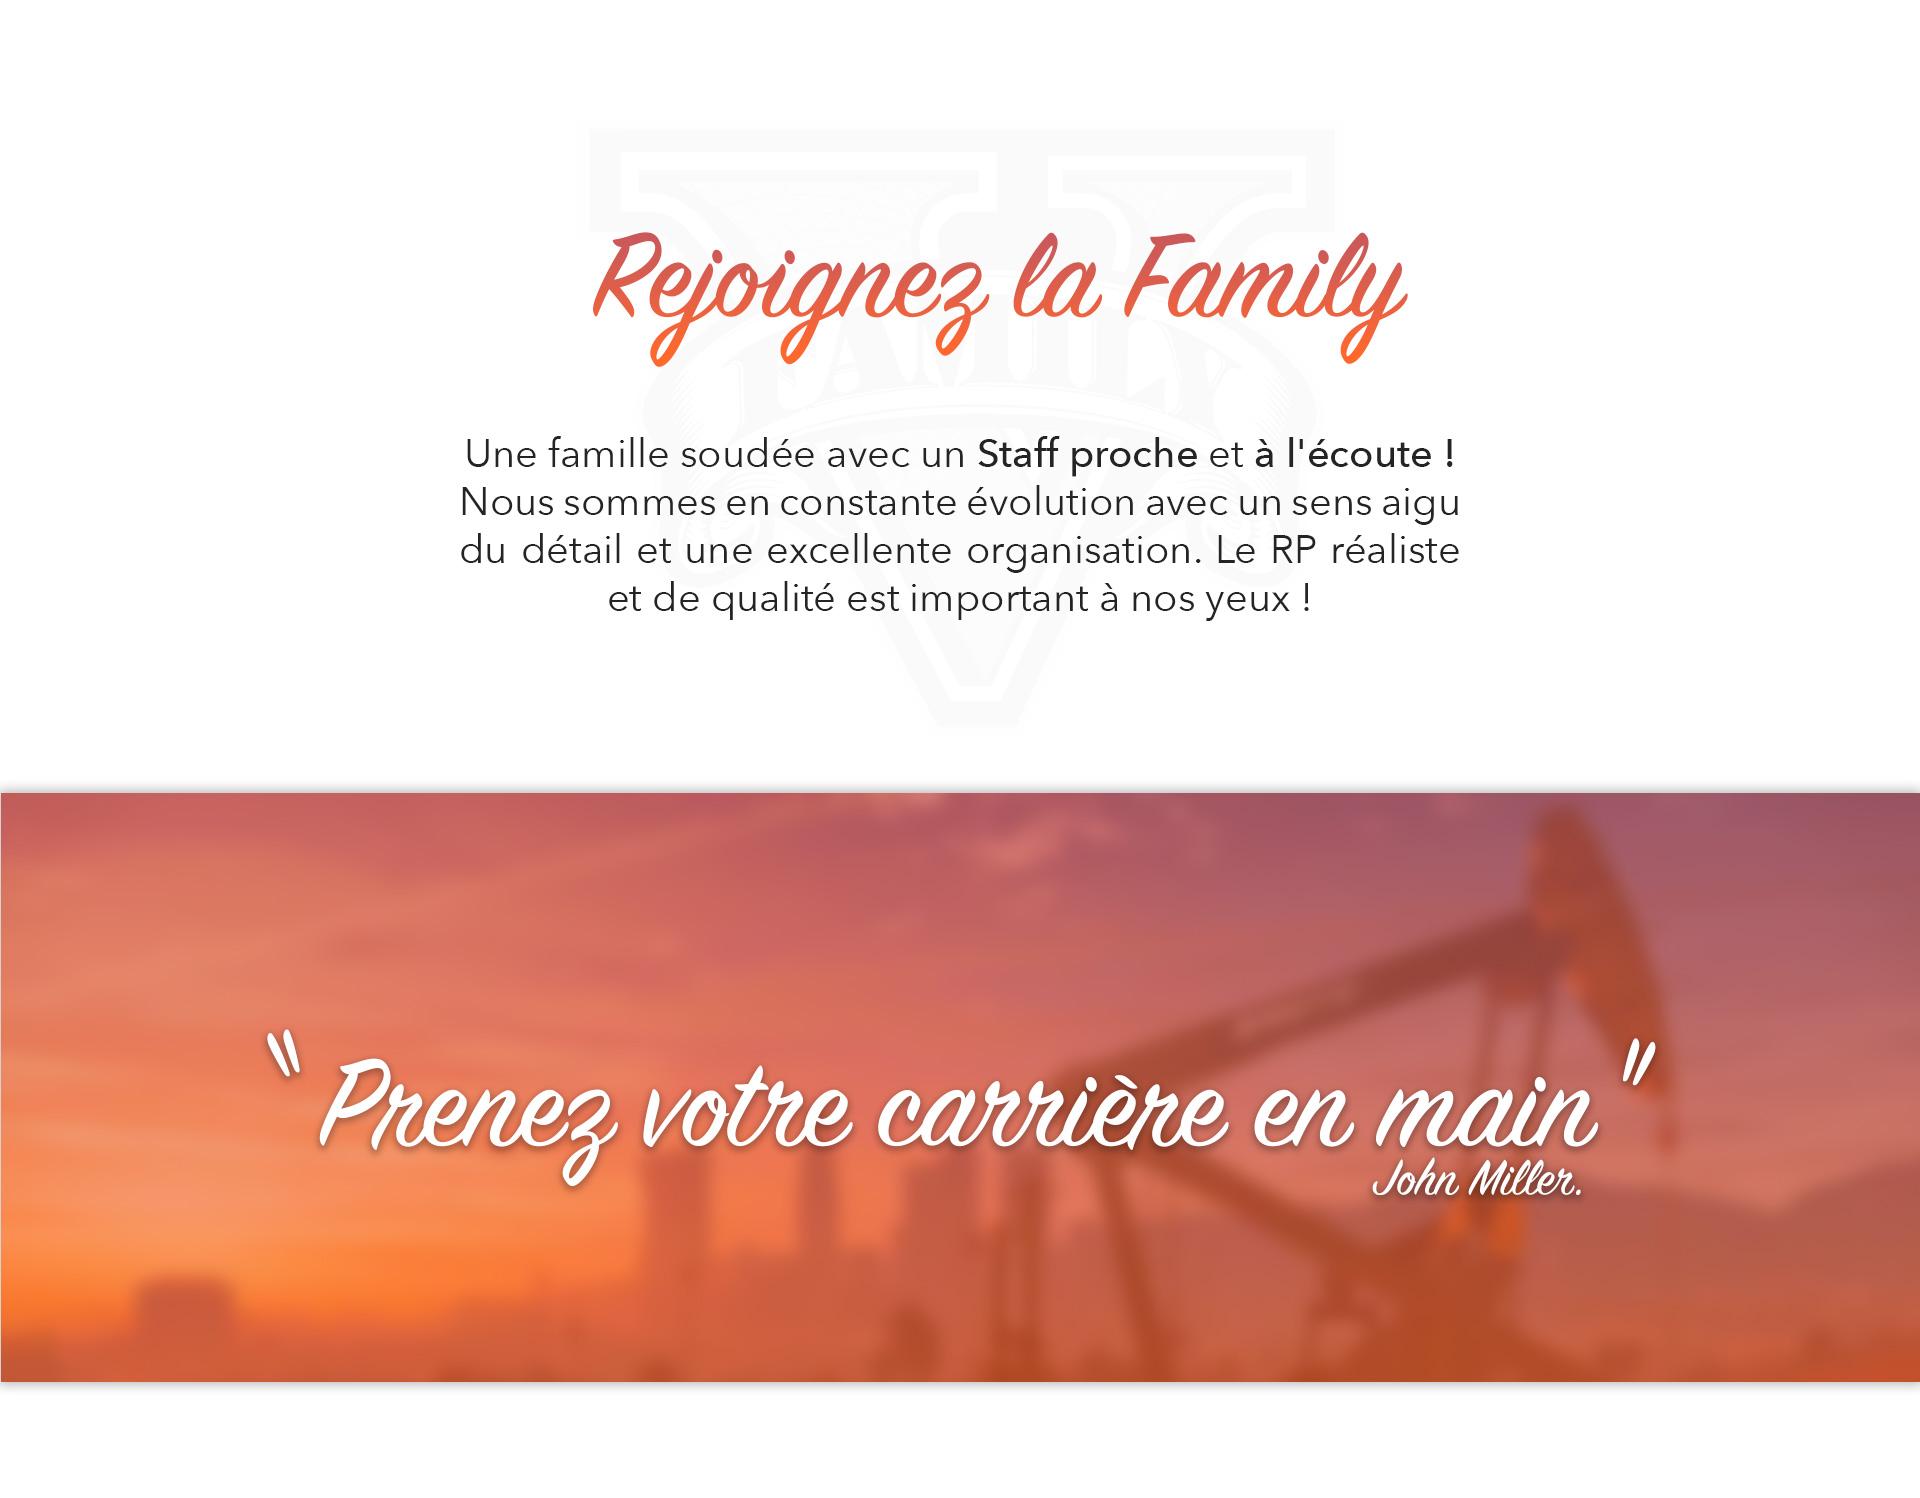 59ef99fa50336-presentation_family_01.jpg